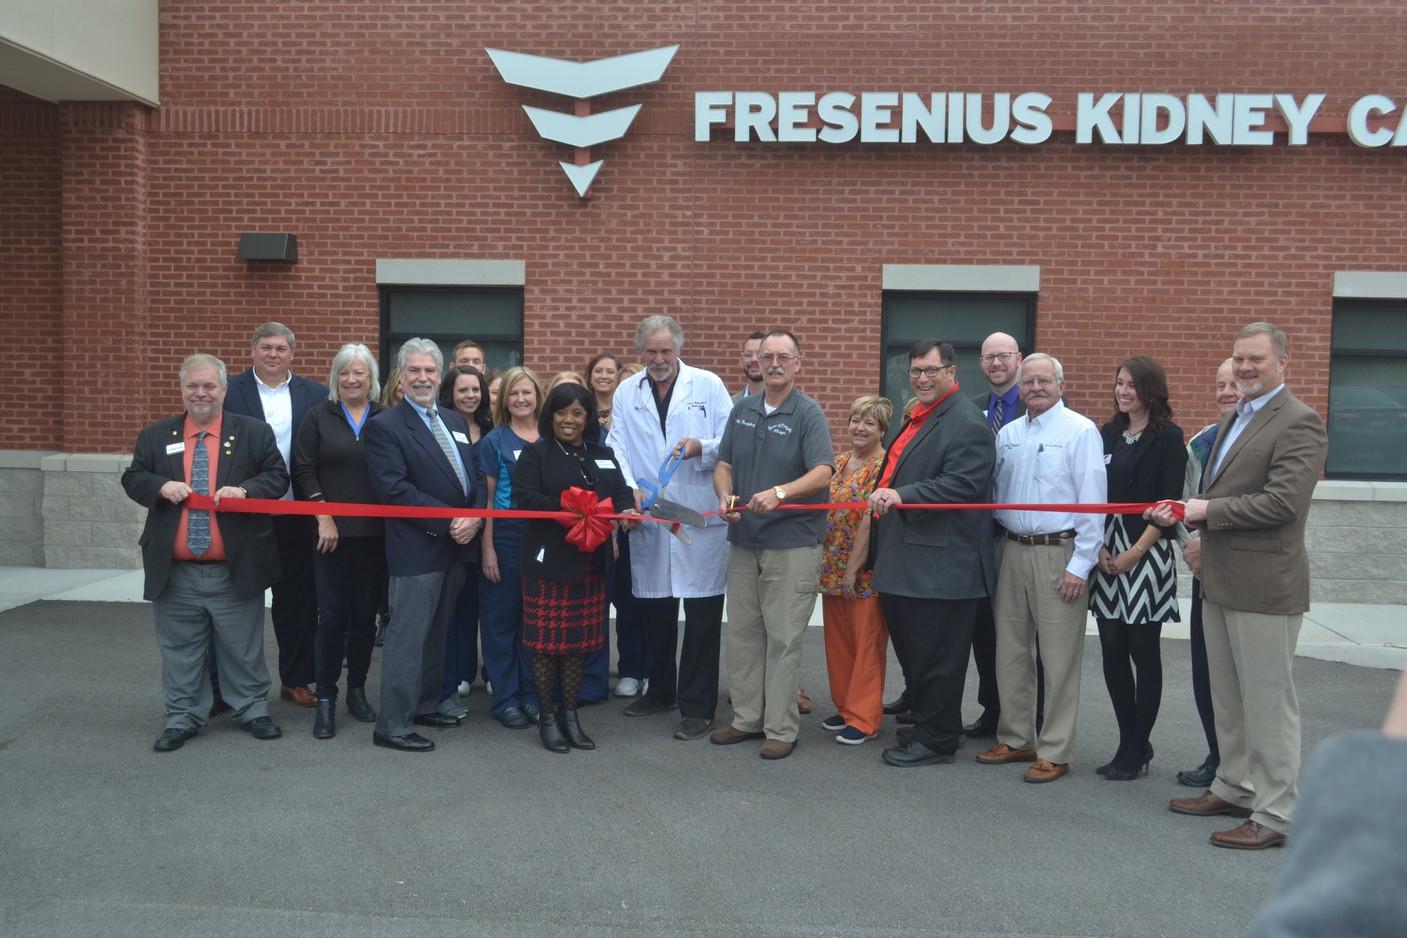 Fresenius Kidney Care Dialysis Center